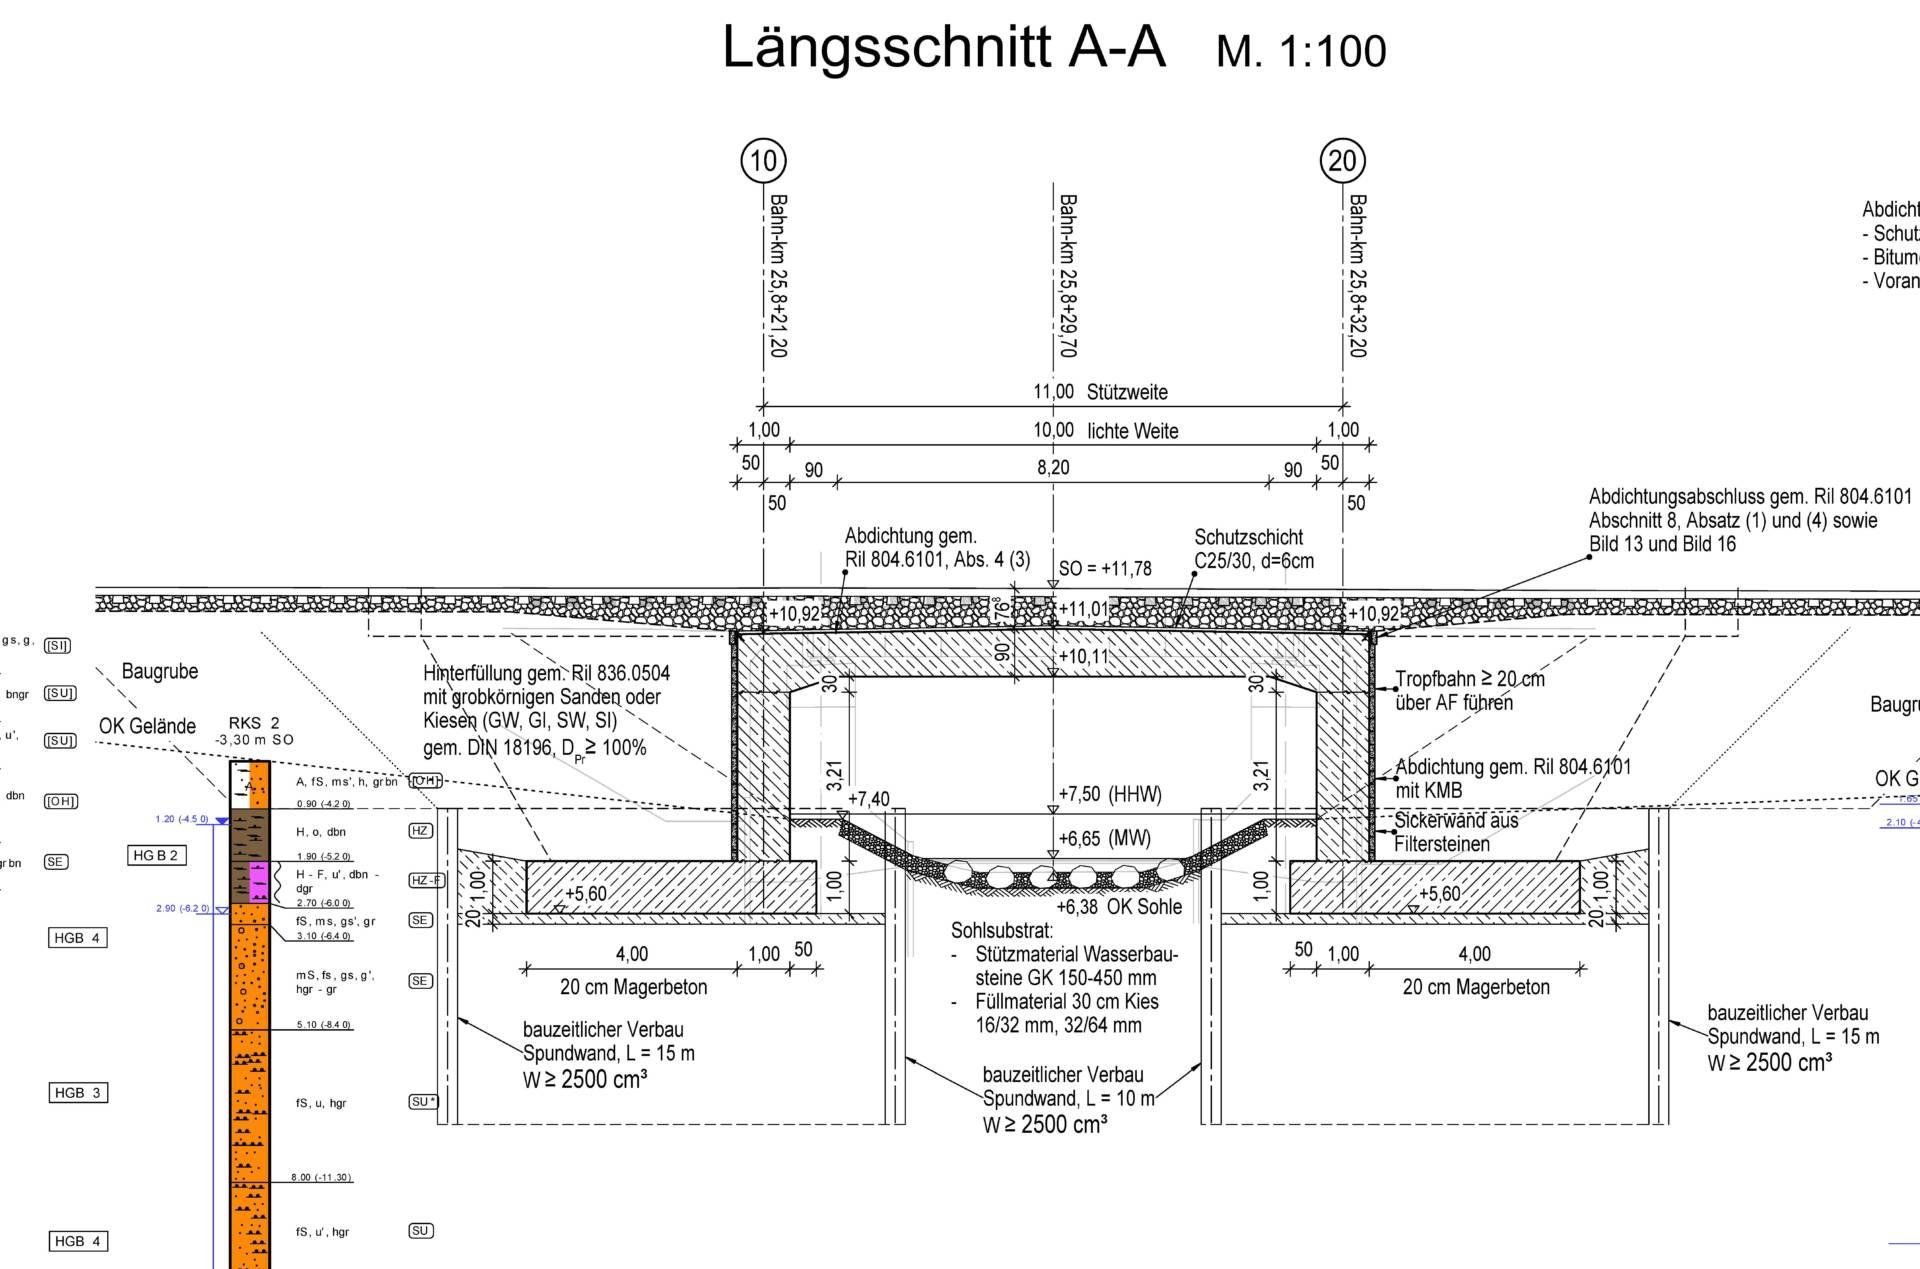 Plan Strecke 6327, Neubau Randowbrücke Km 25,824